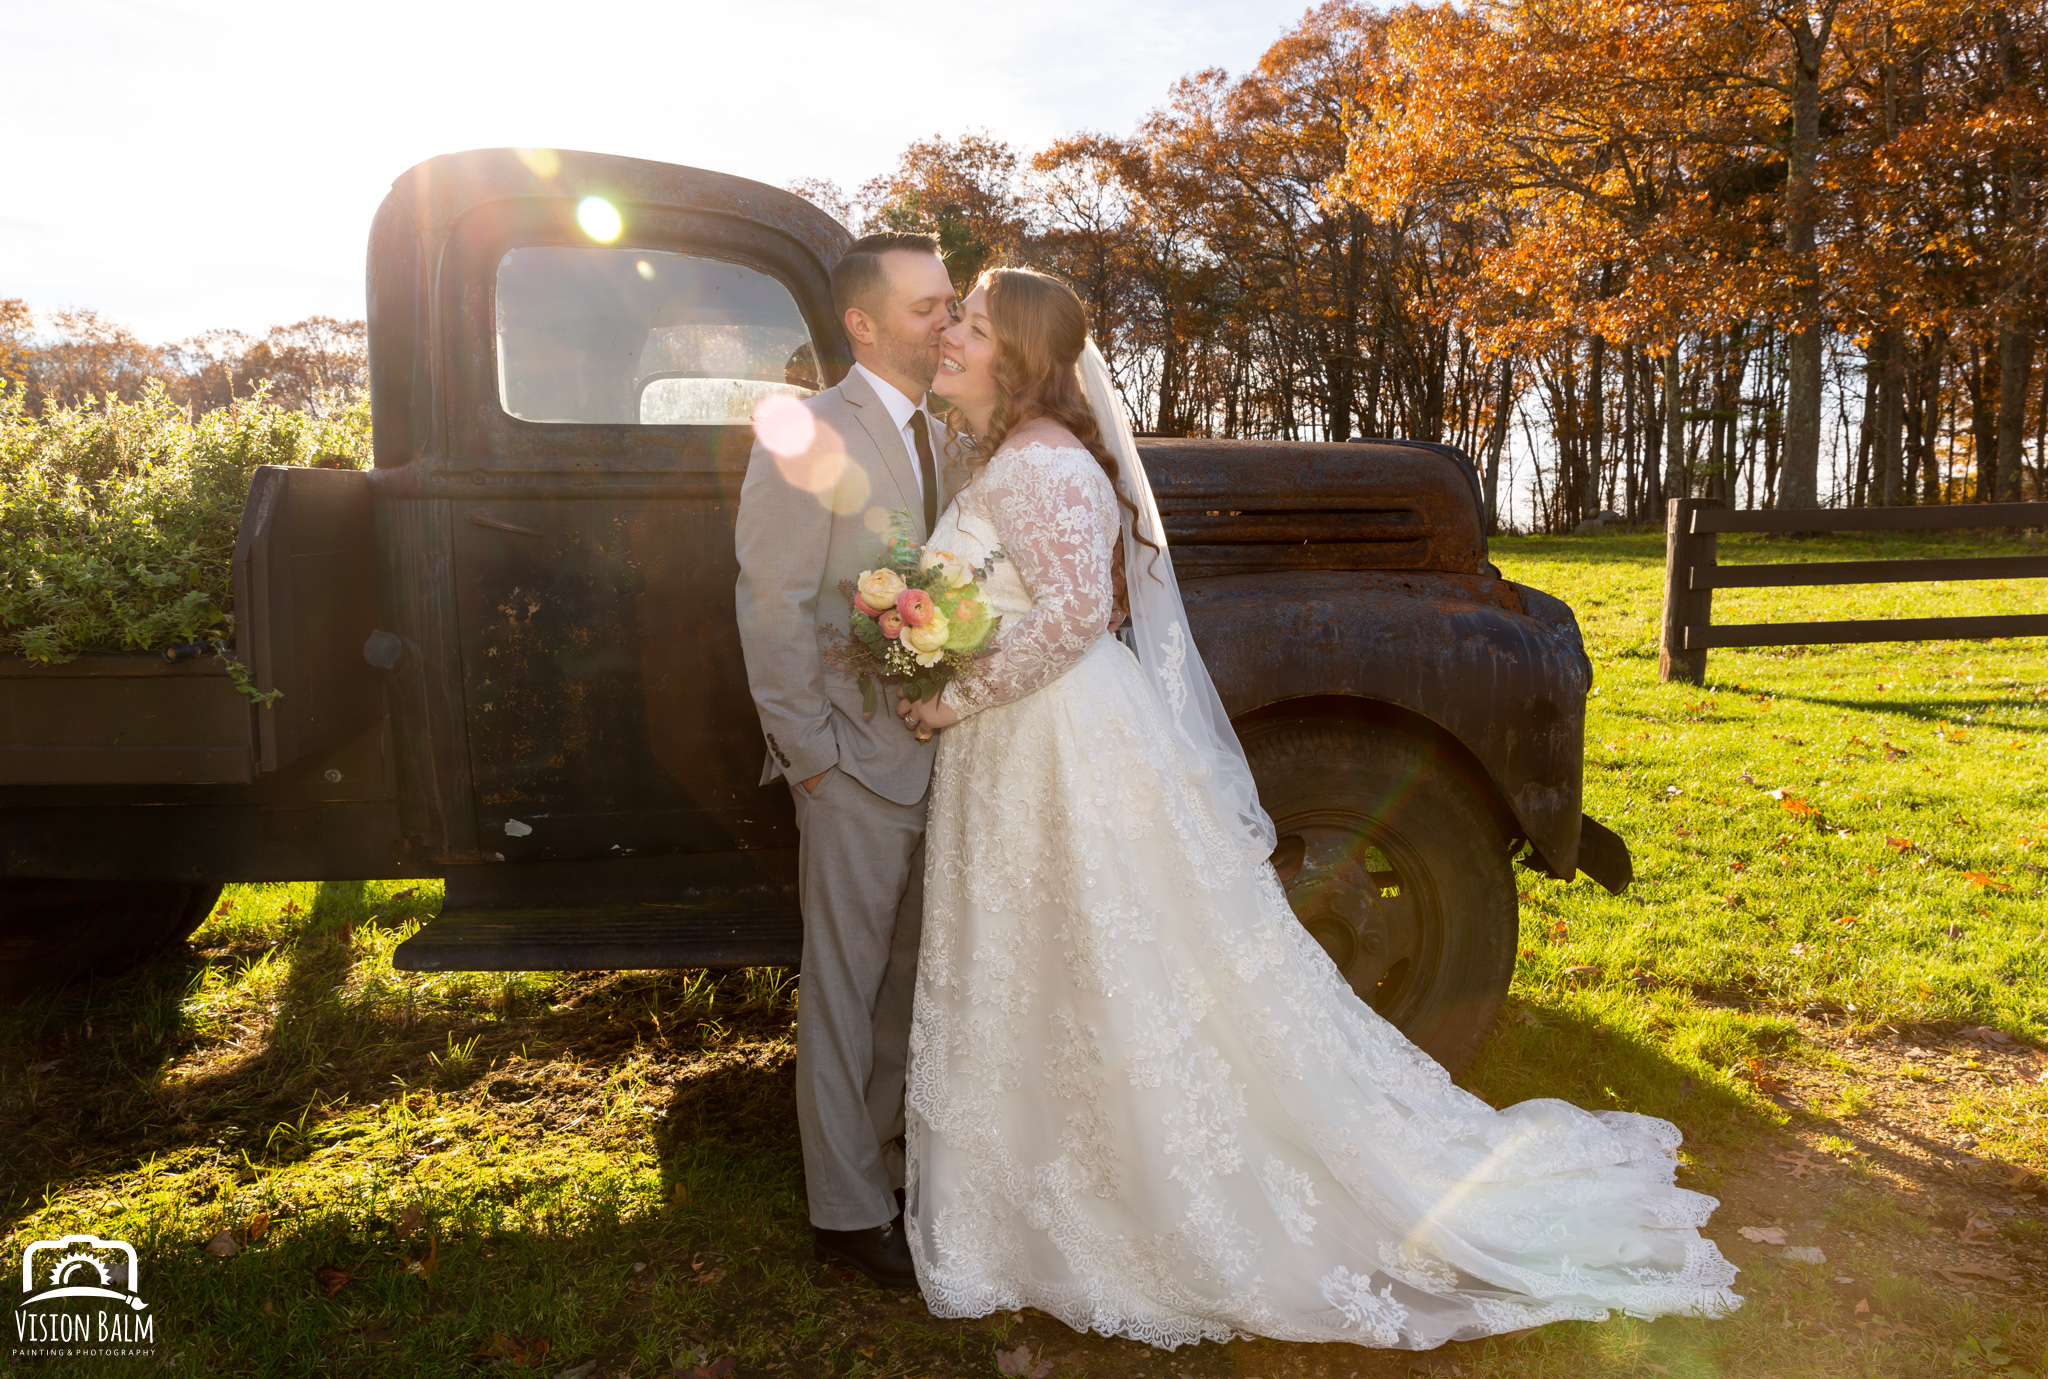 Wedding formal photo of bride groom in Zuka's Hilltop Barn by Vision Balm in Charleston, SC.